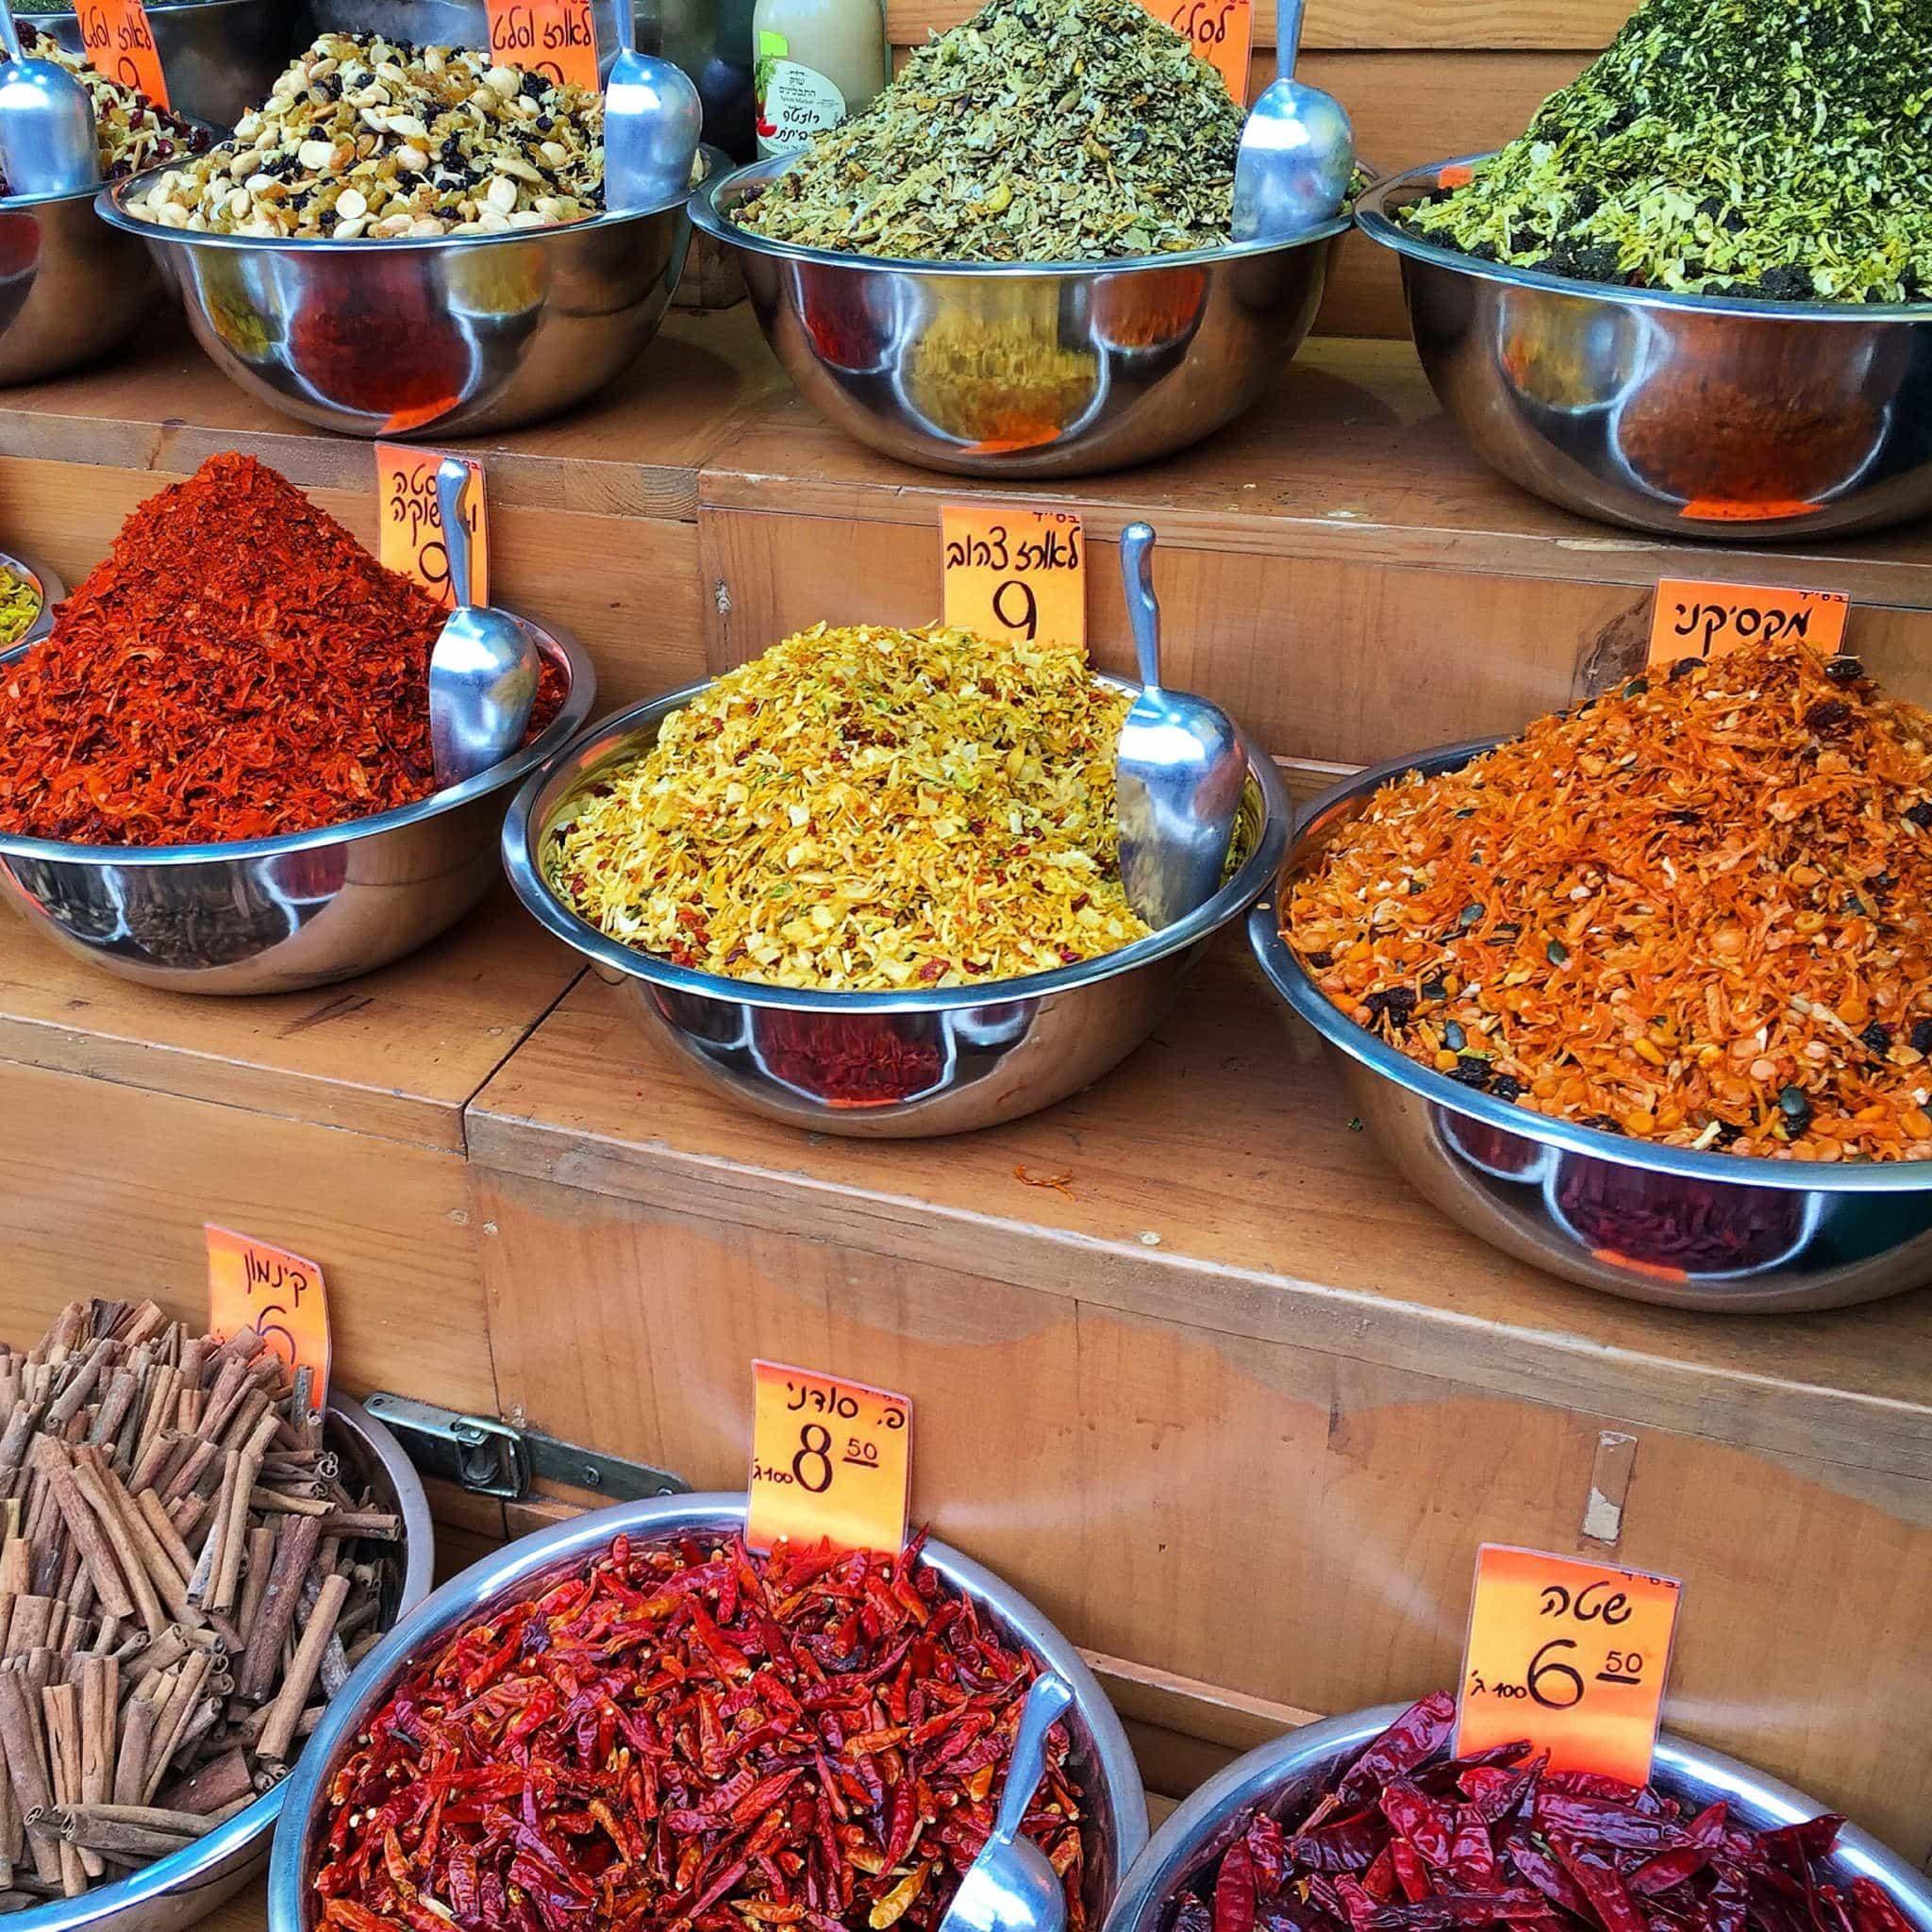 Shopping the shuks, or souks, in Israel